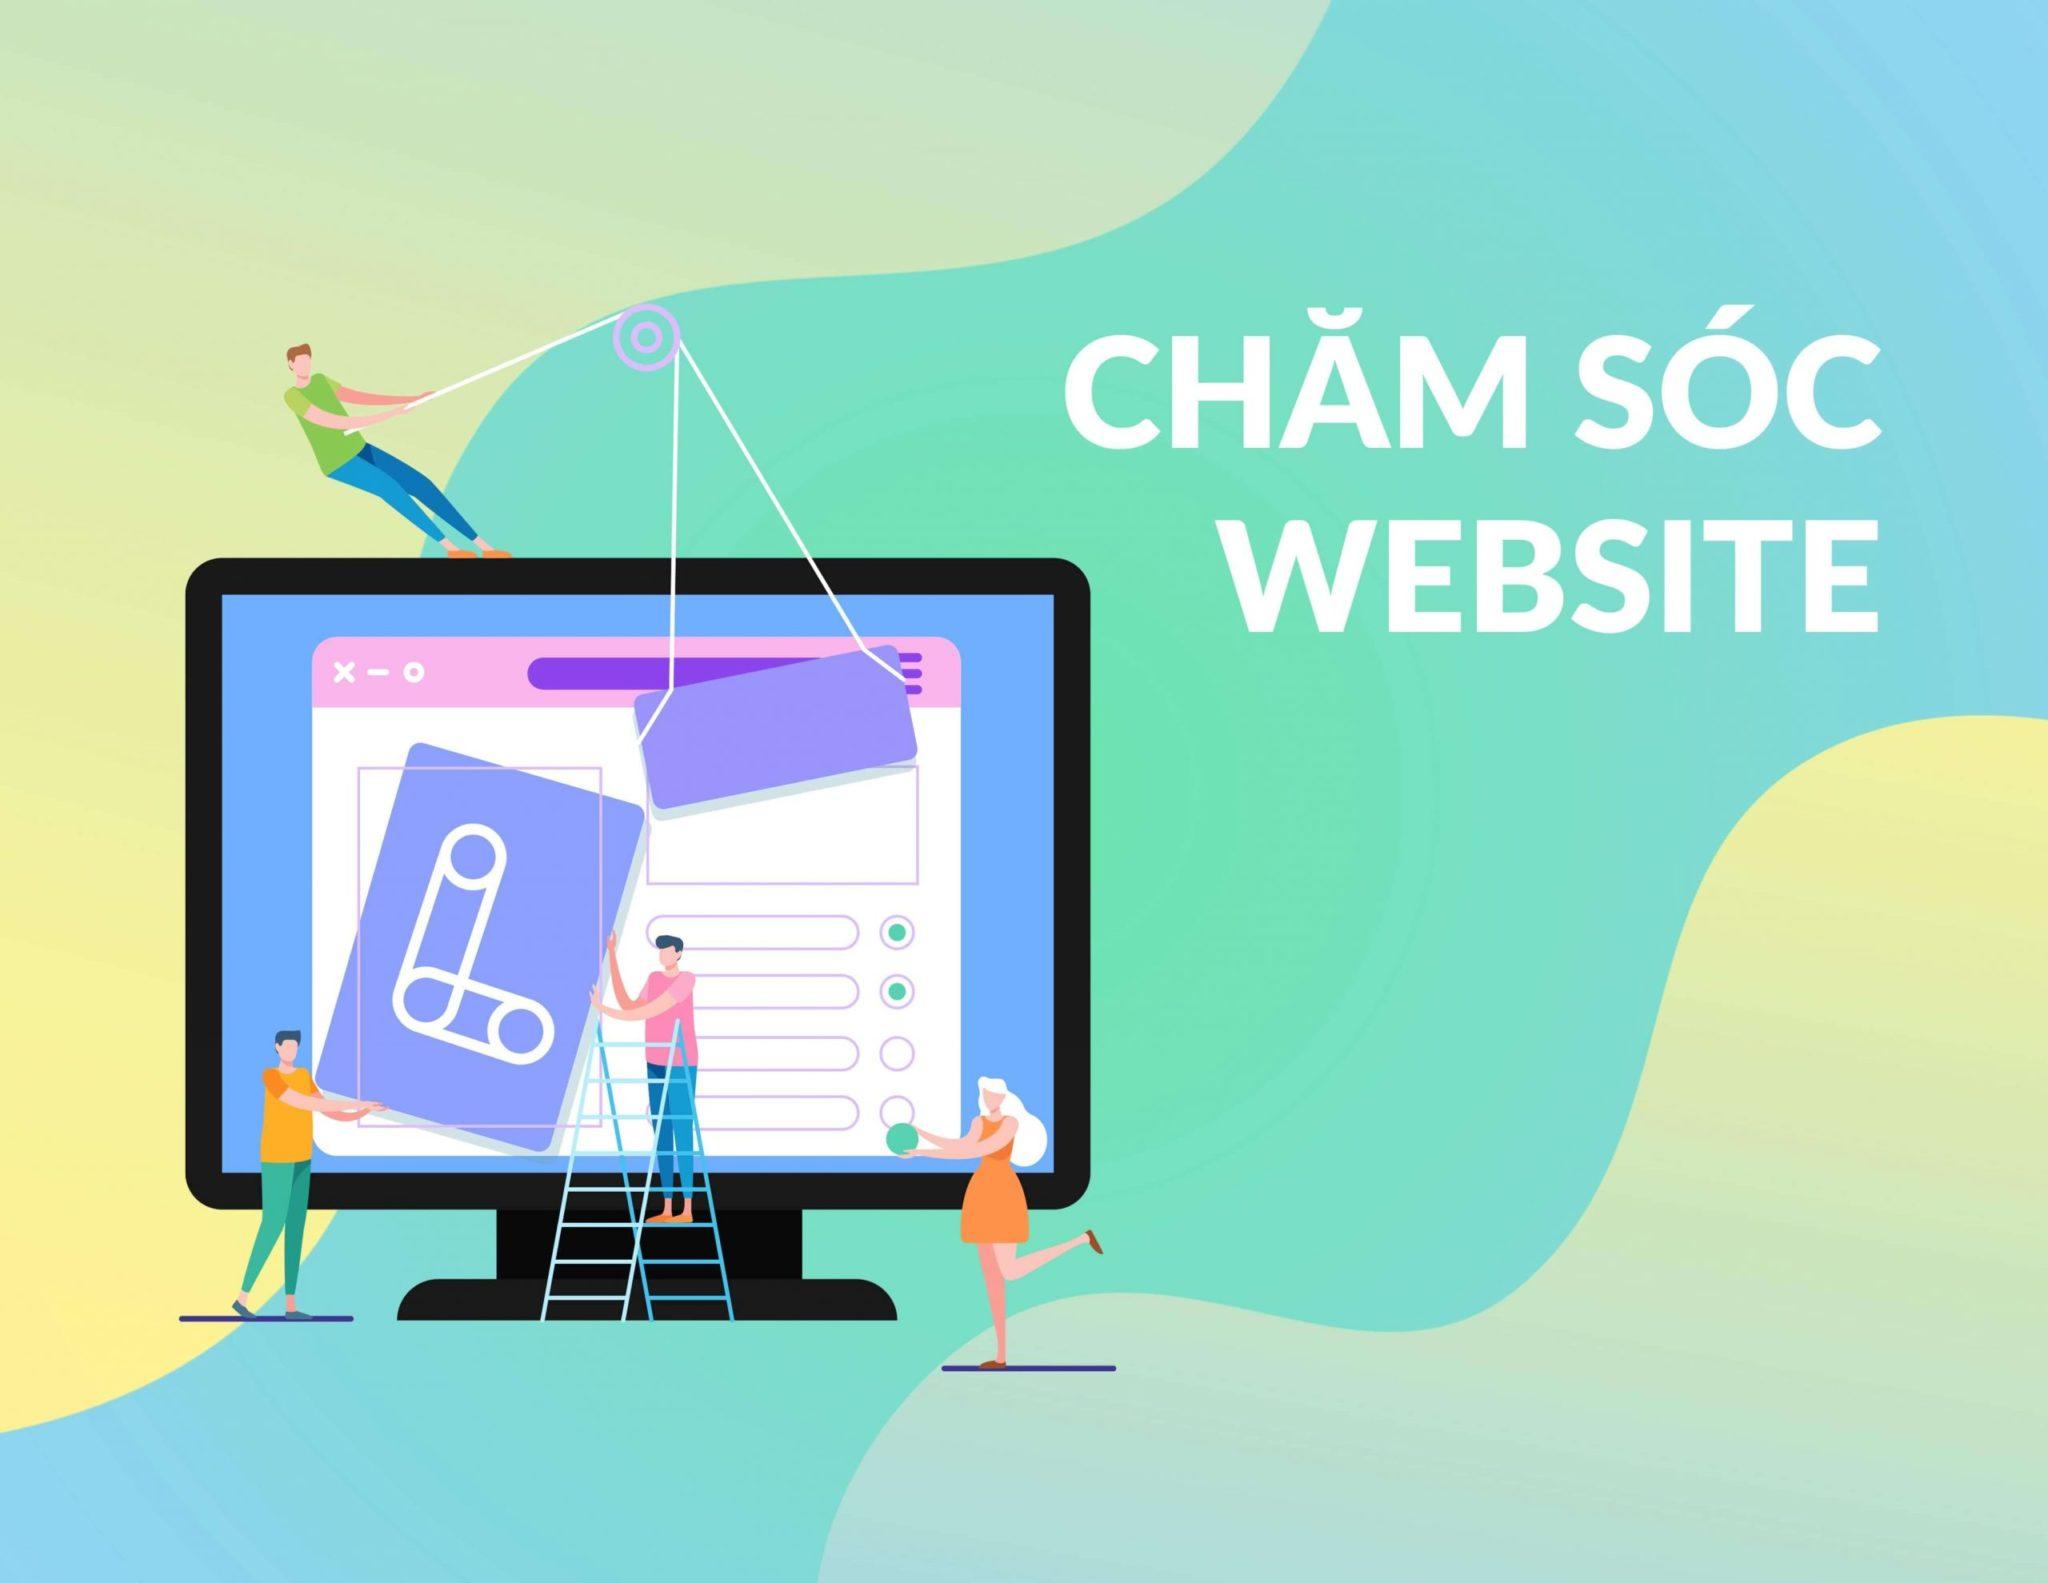 dịch vụ chăm sóc website